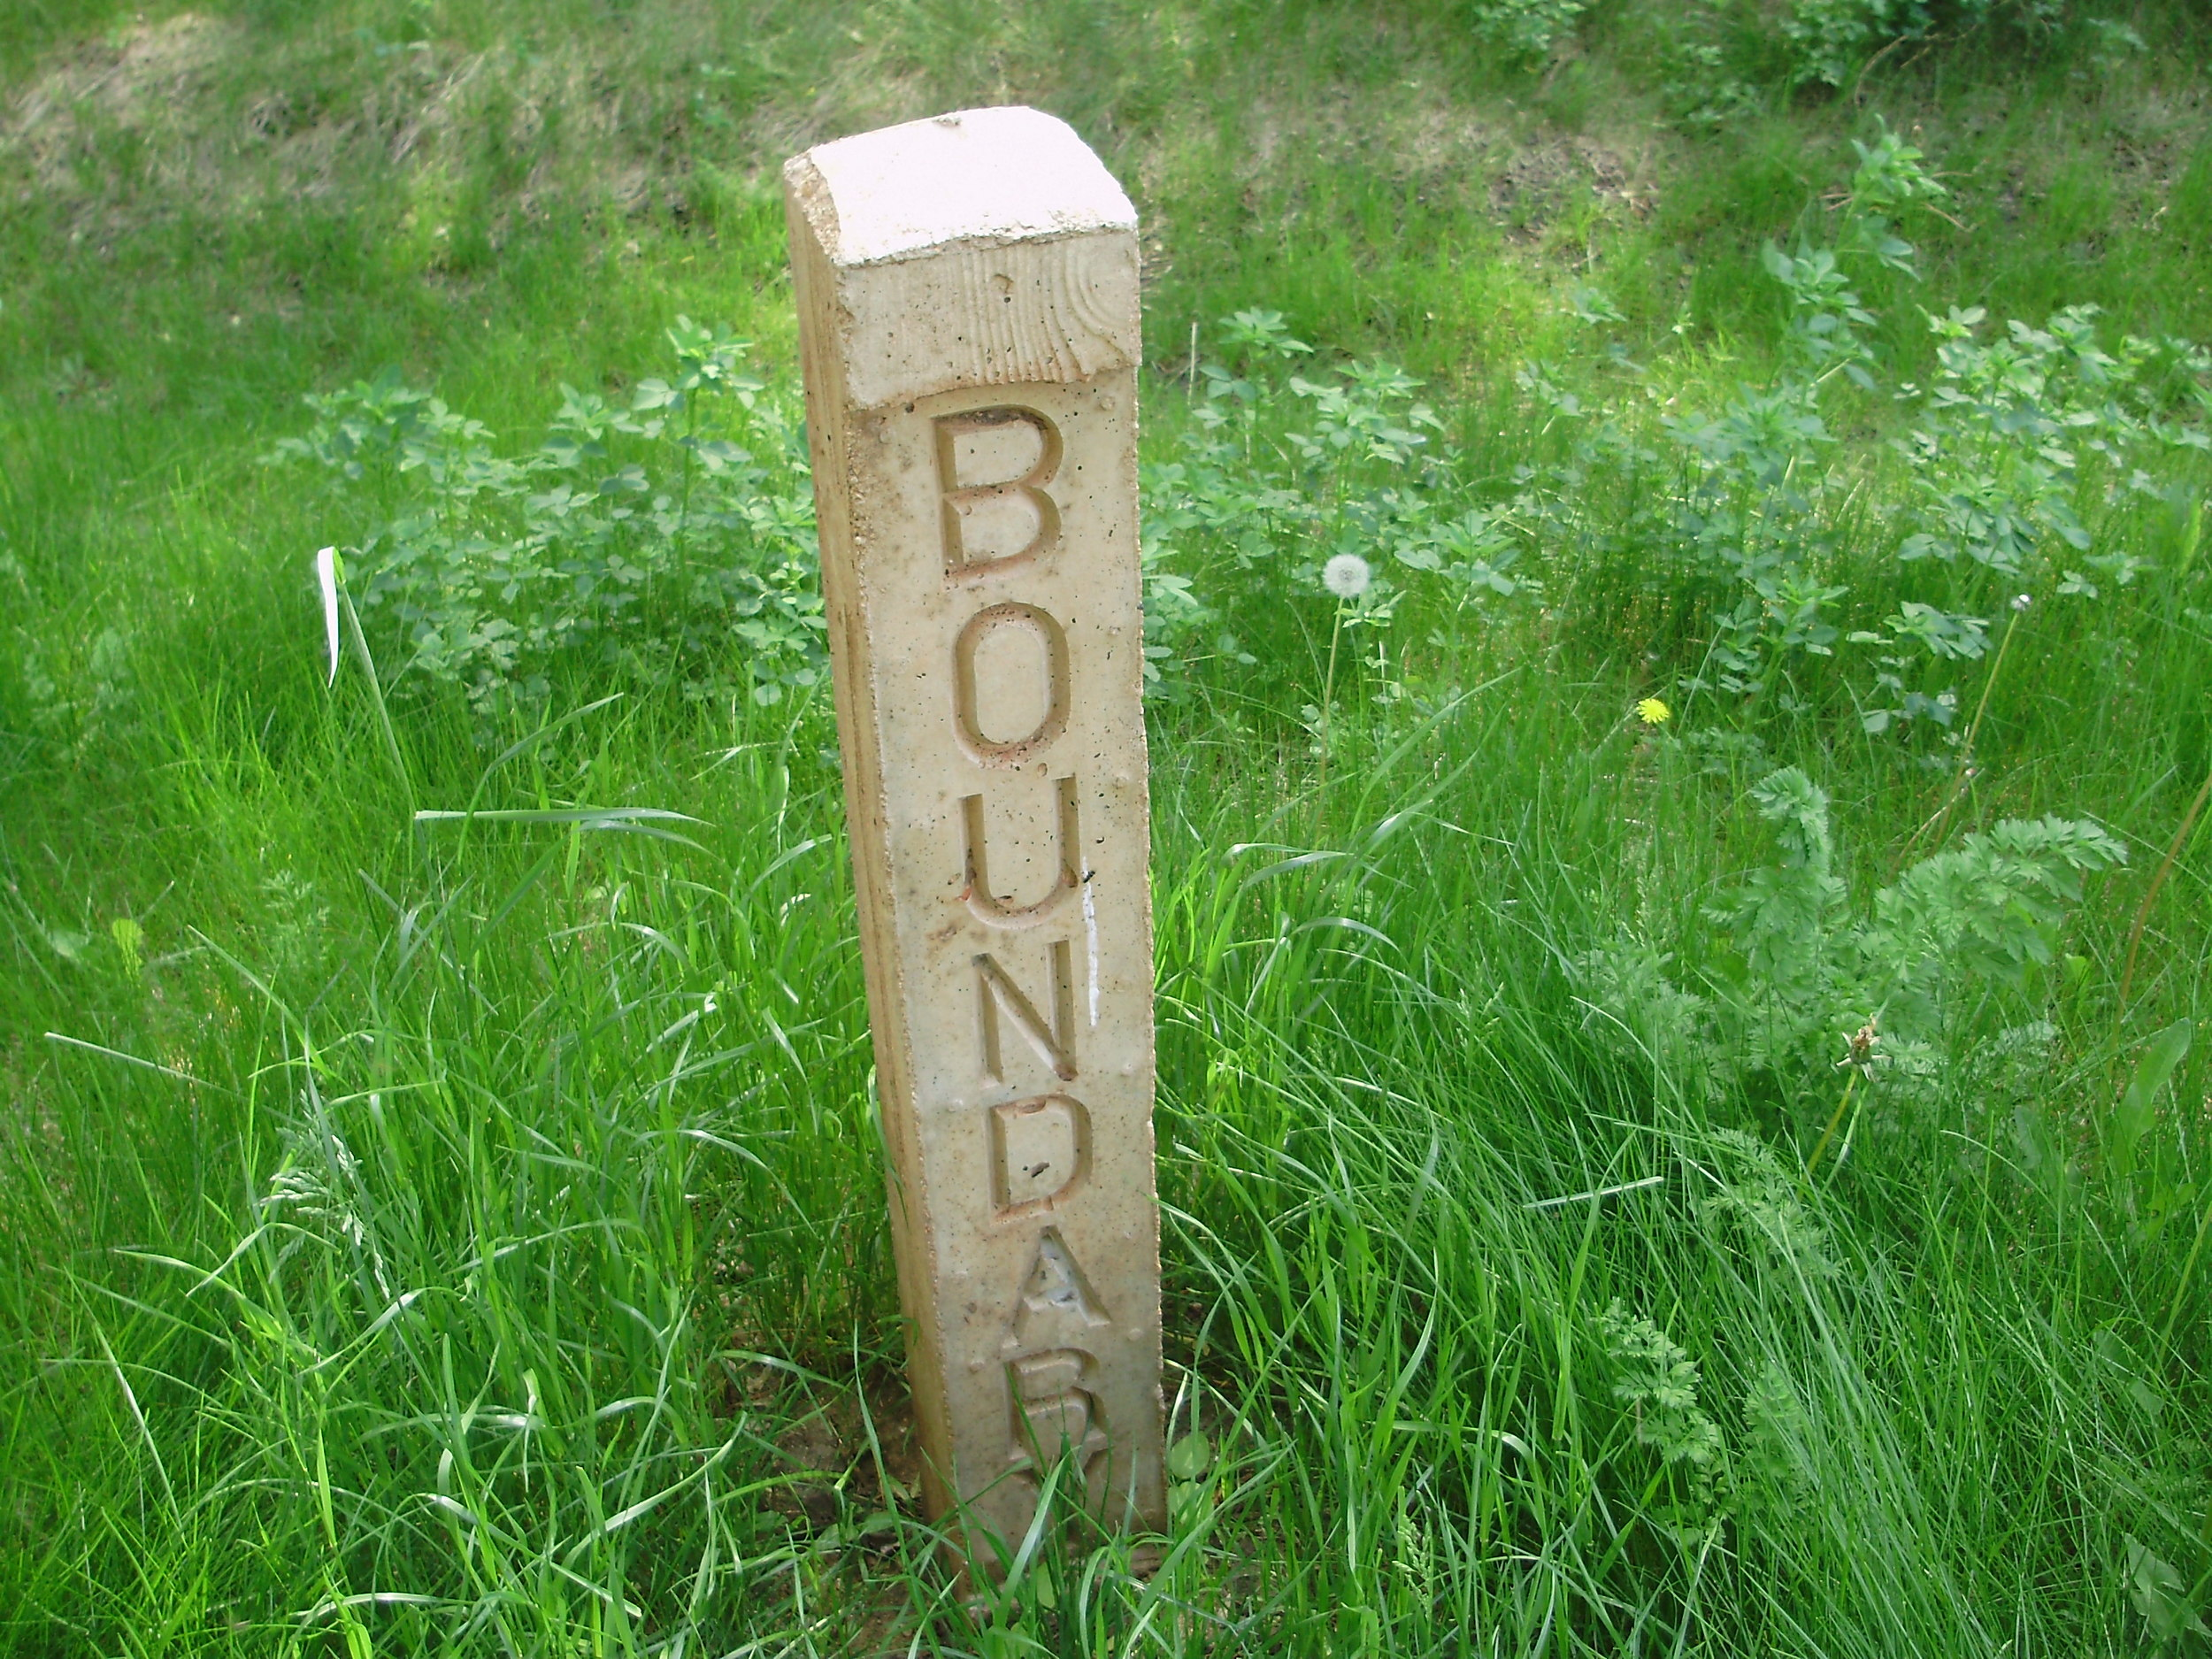 6.2 Boundary – Joshua Hilgart-Roy, Flickr